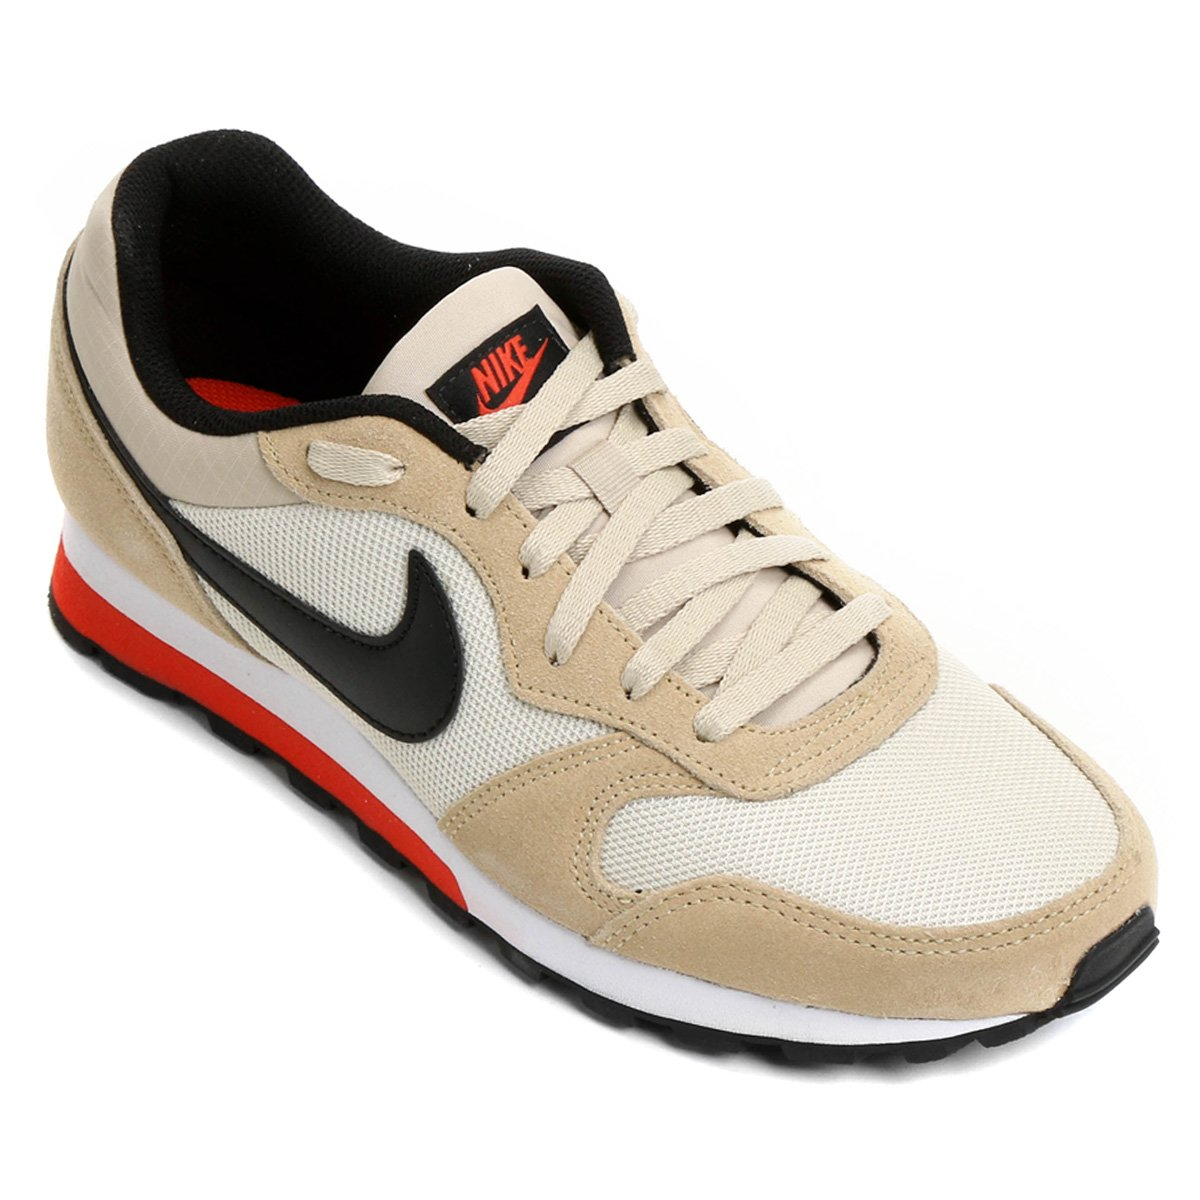 Tênis Nike Md Runner 2 Masculino - Areia e Laranja - Compre Agora ... 5b1792300baf2